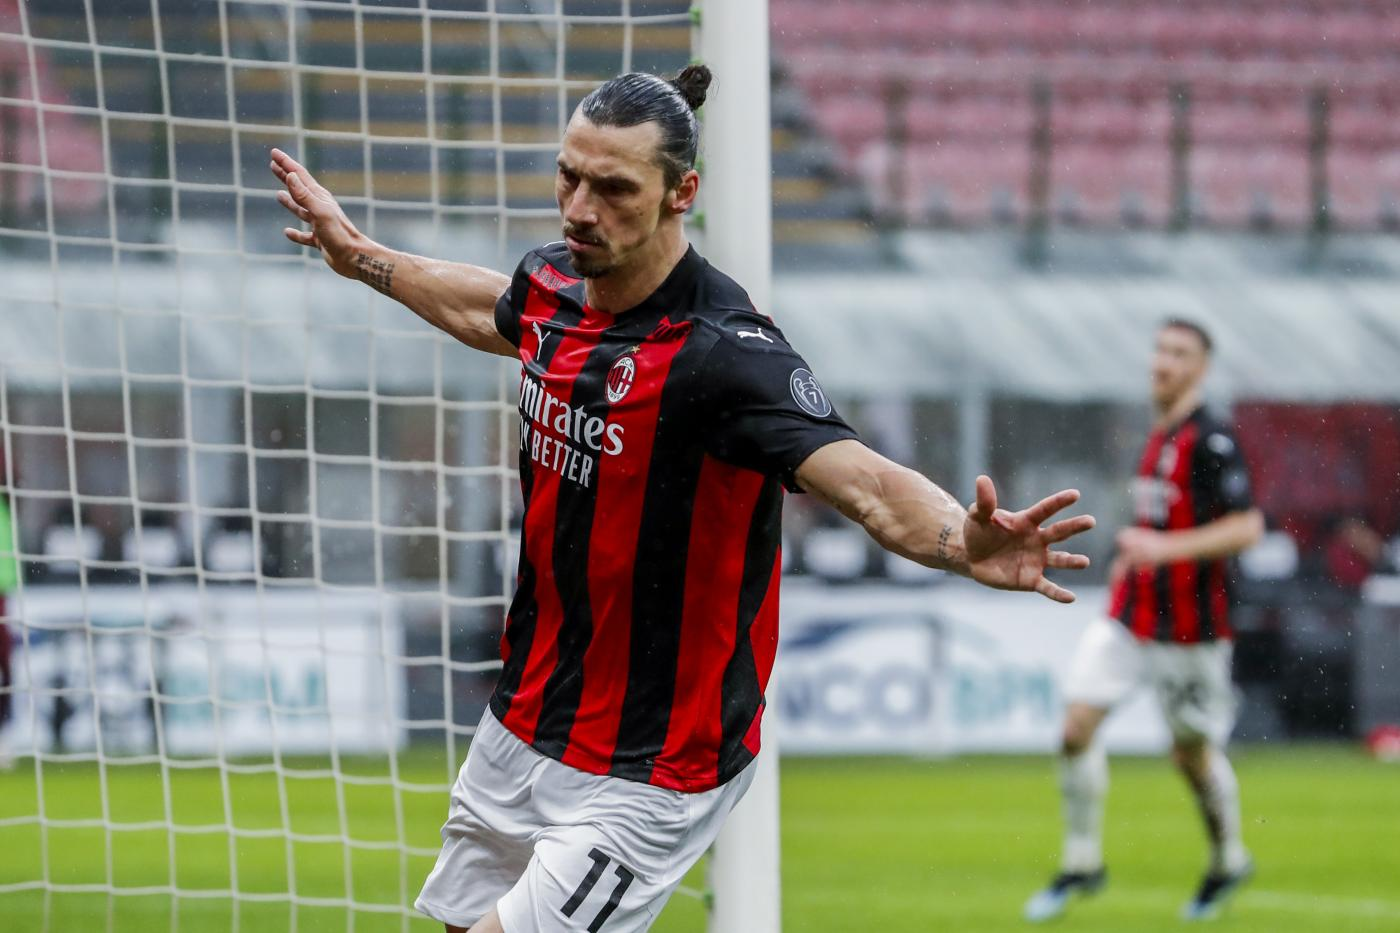 Zlatan Ibrahimovic - Italy Soccer Serie A